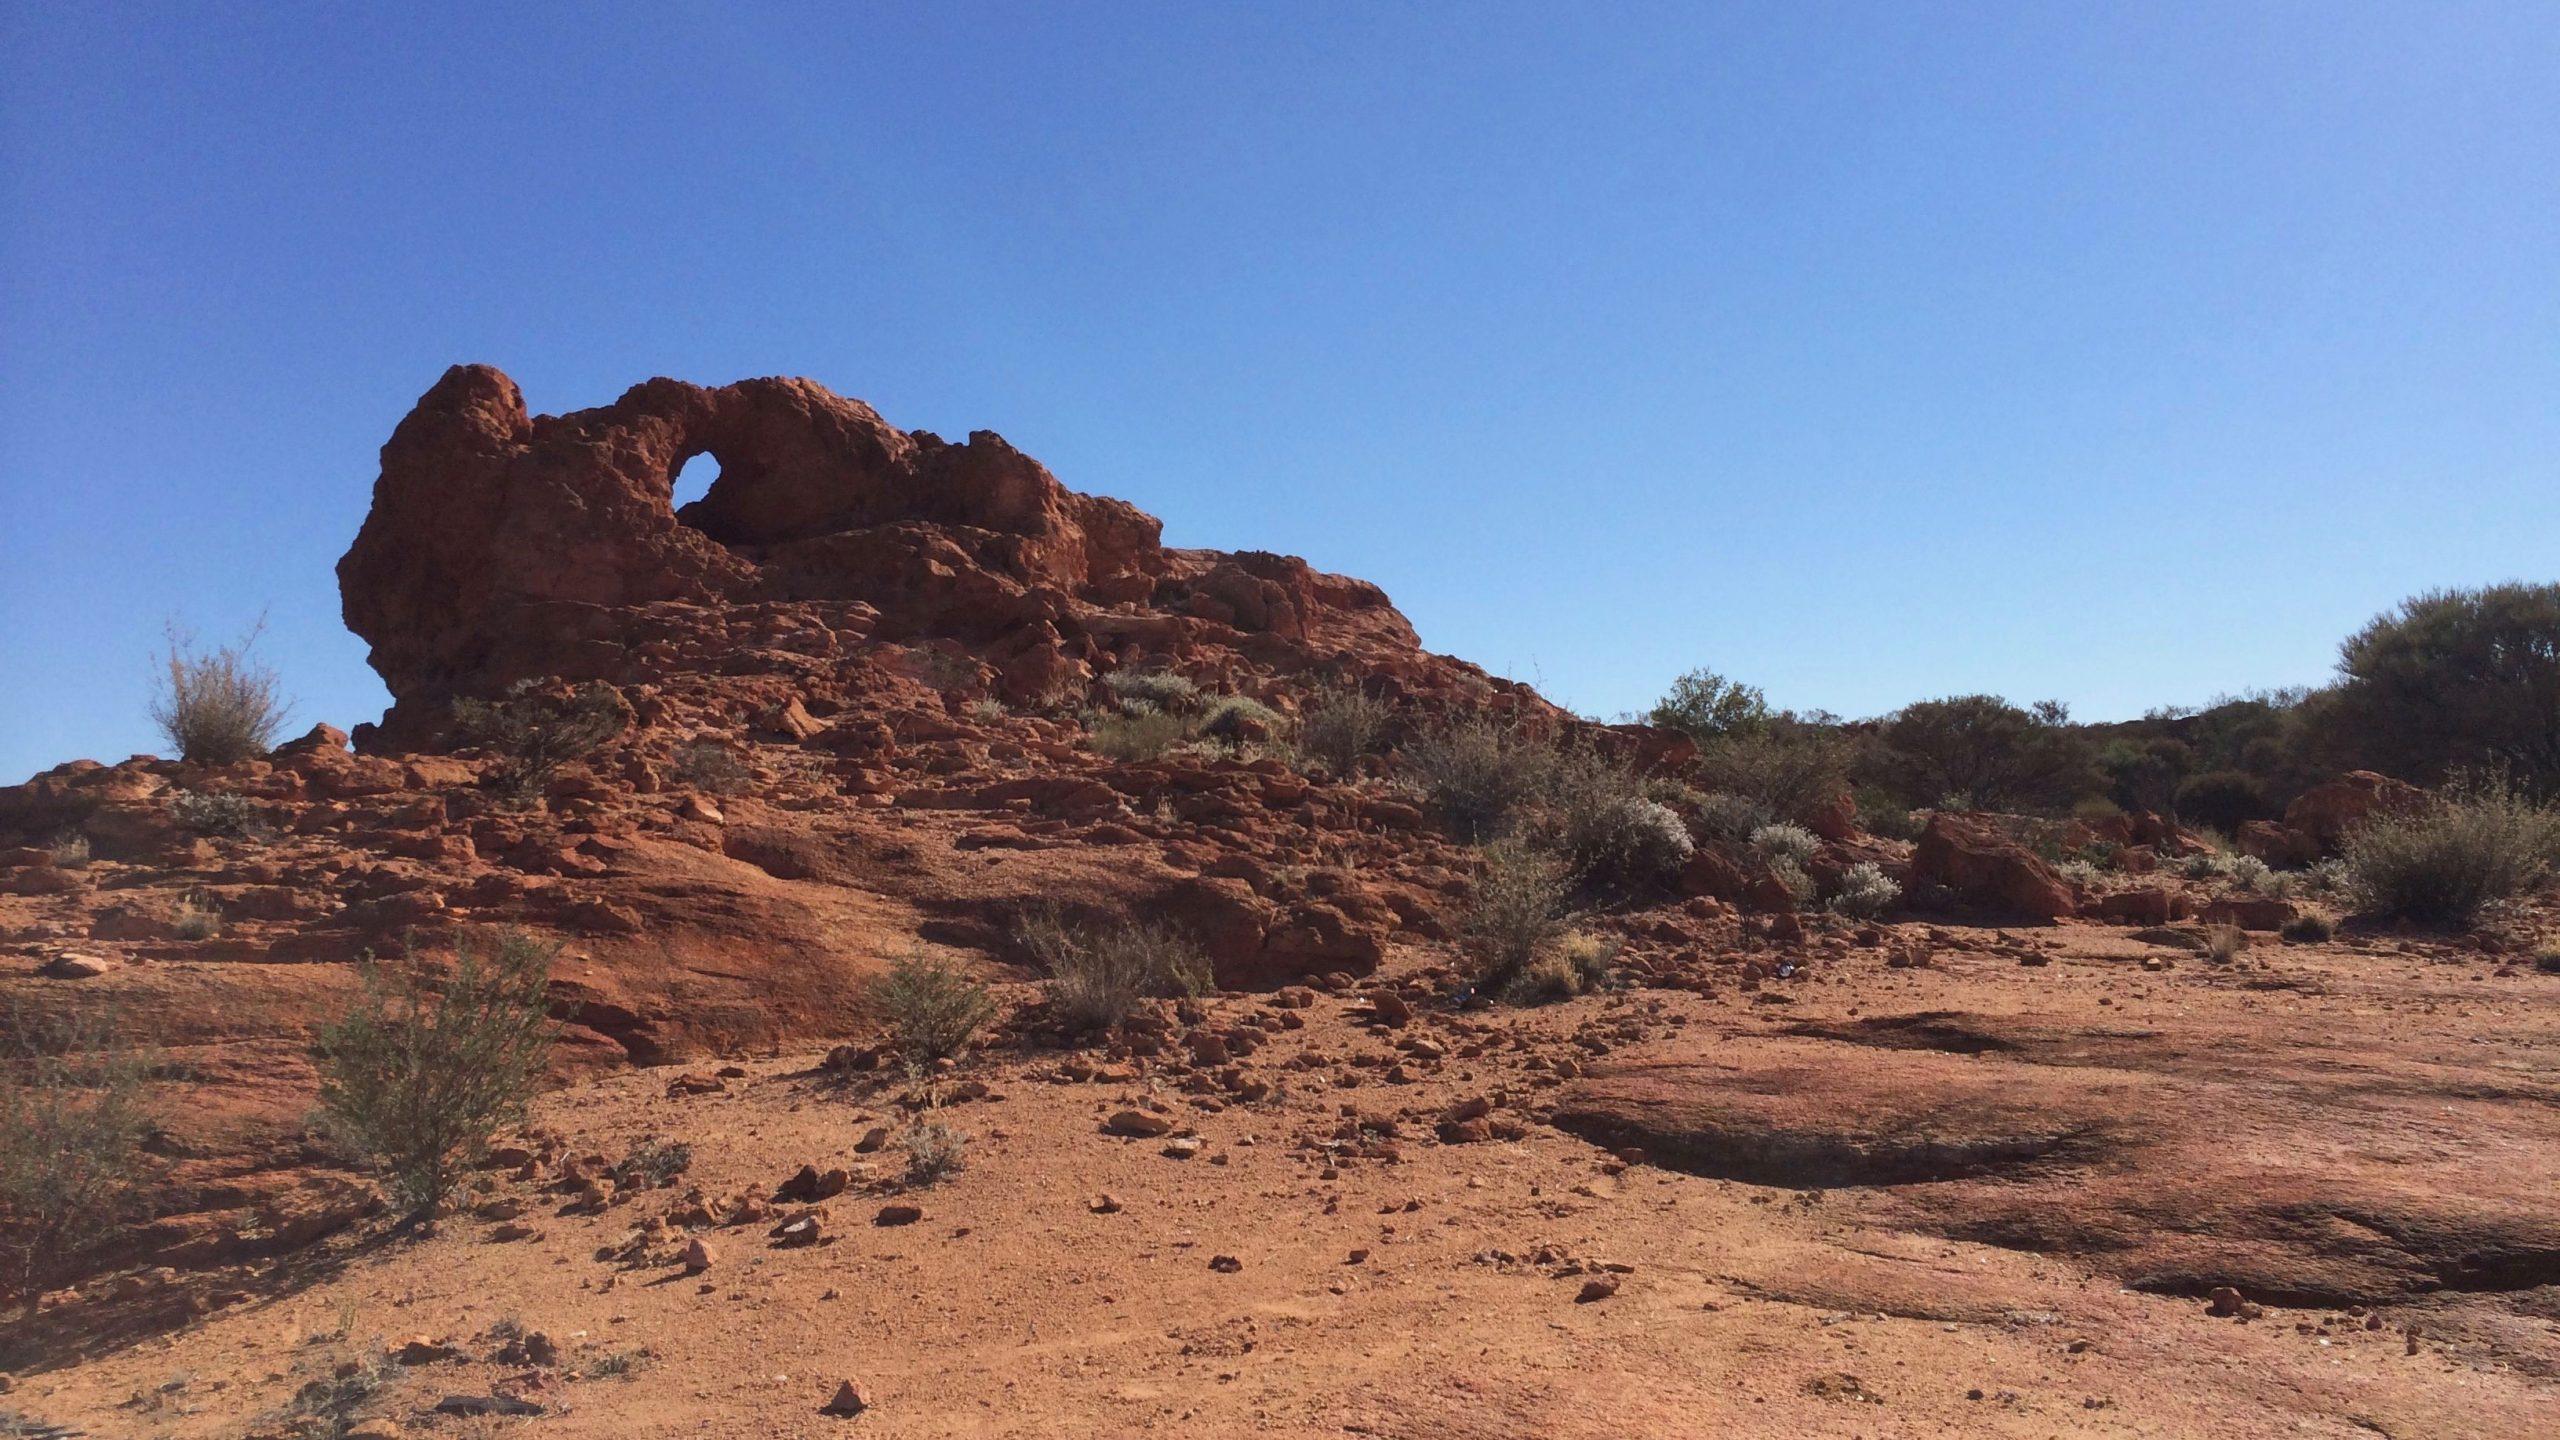 Aboriginal land rights Australia